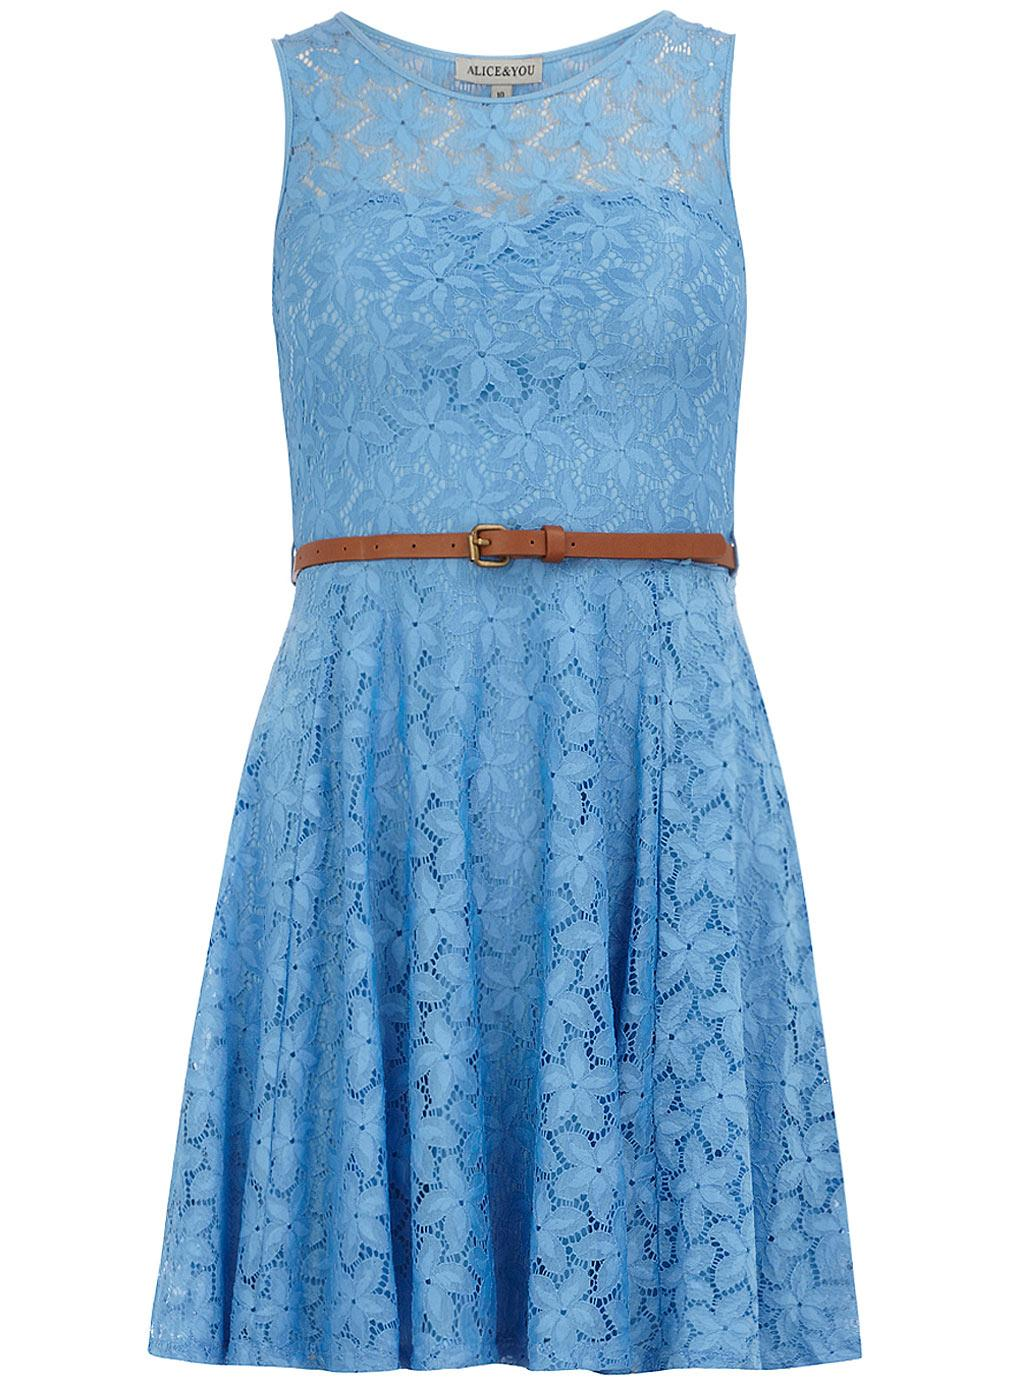 Robe bleu ciel dentelle